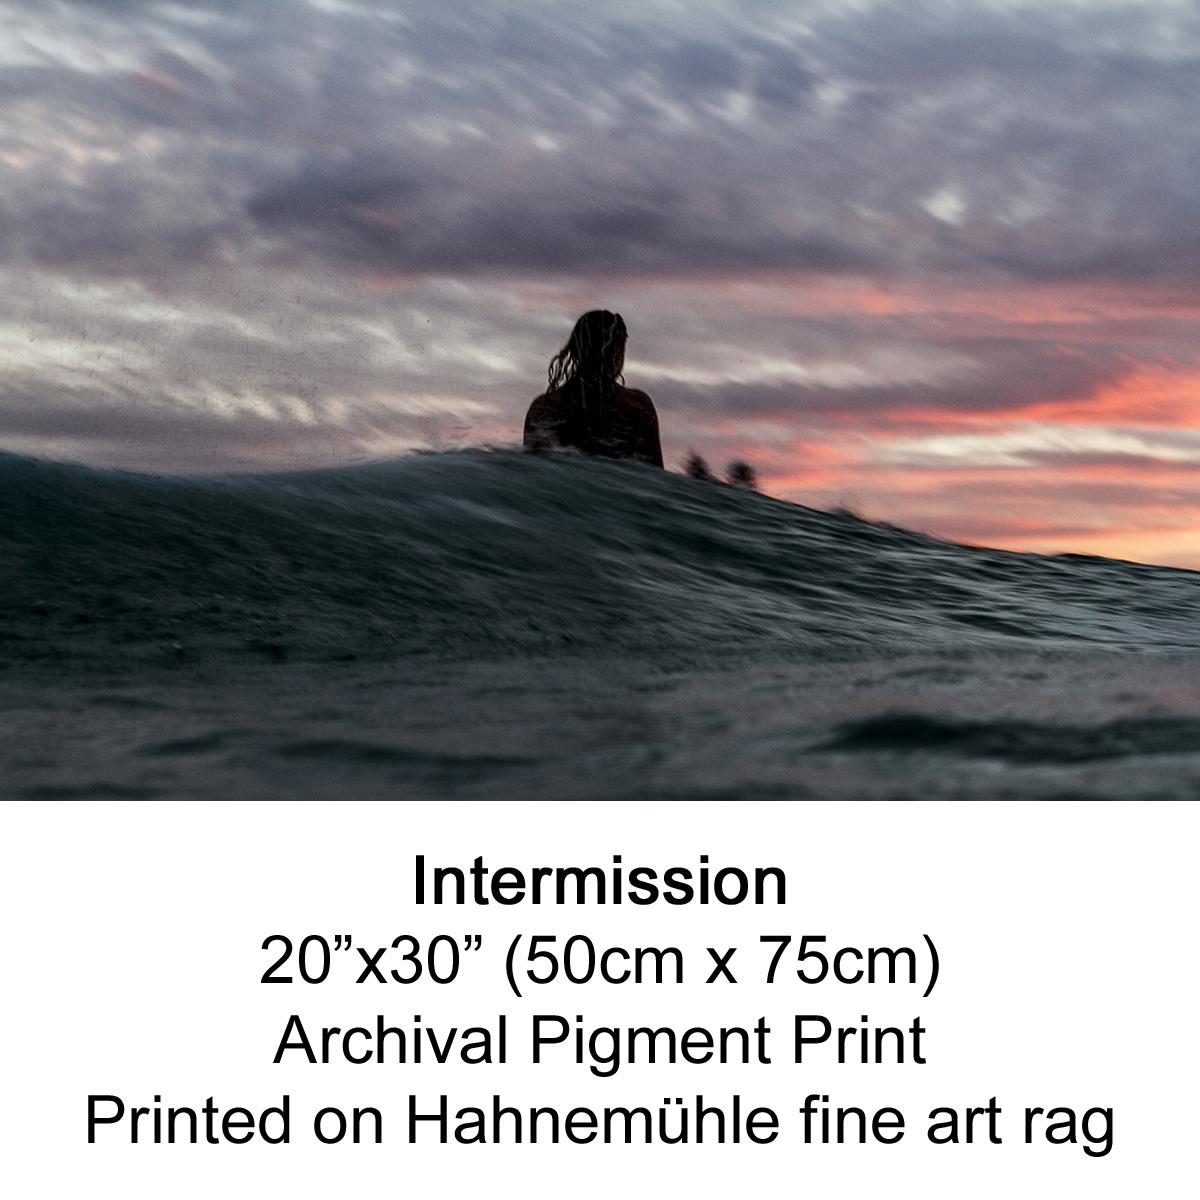 Intermission by fran miller.jpg